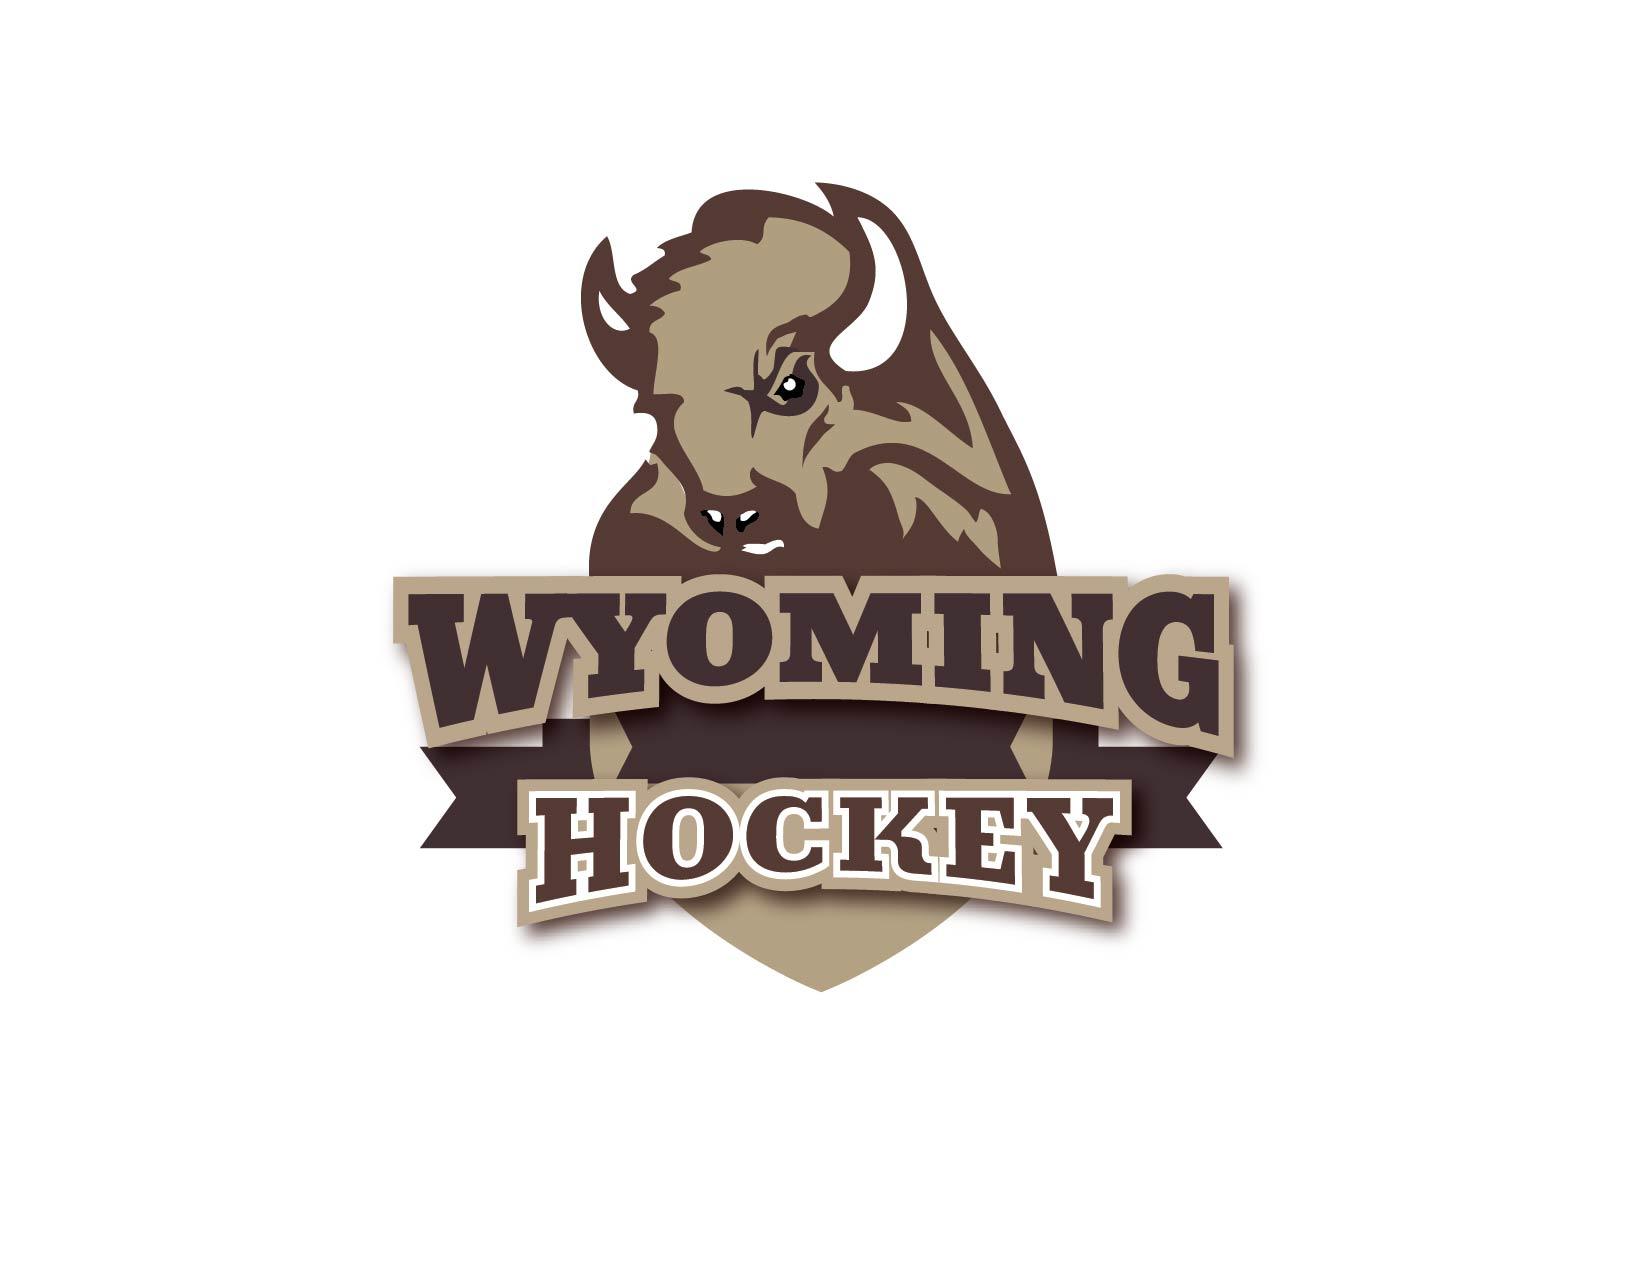 Team Wyoming